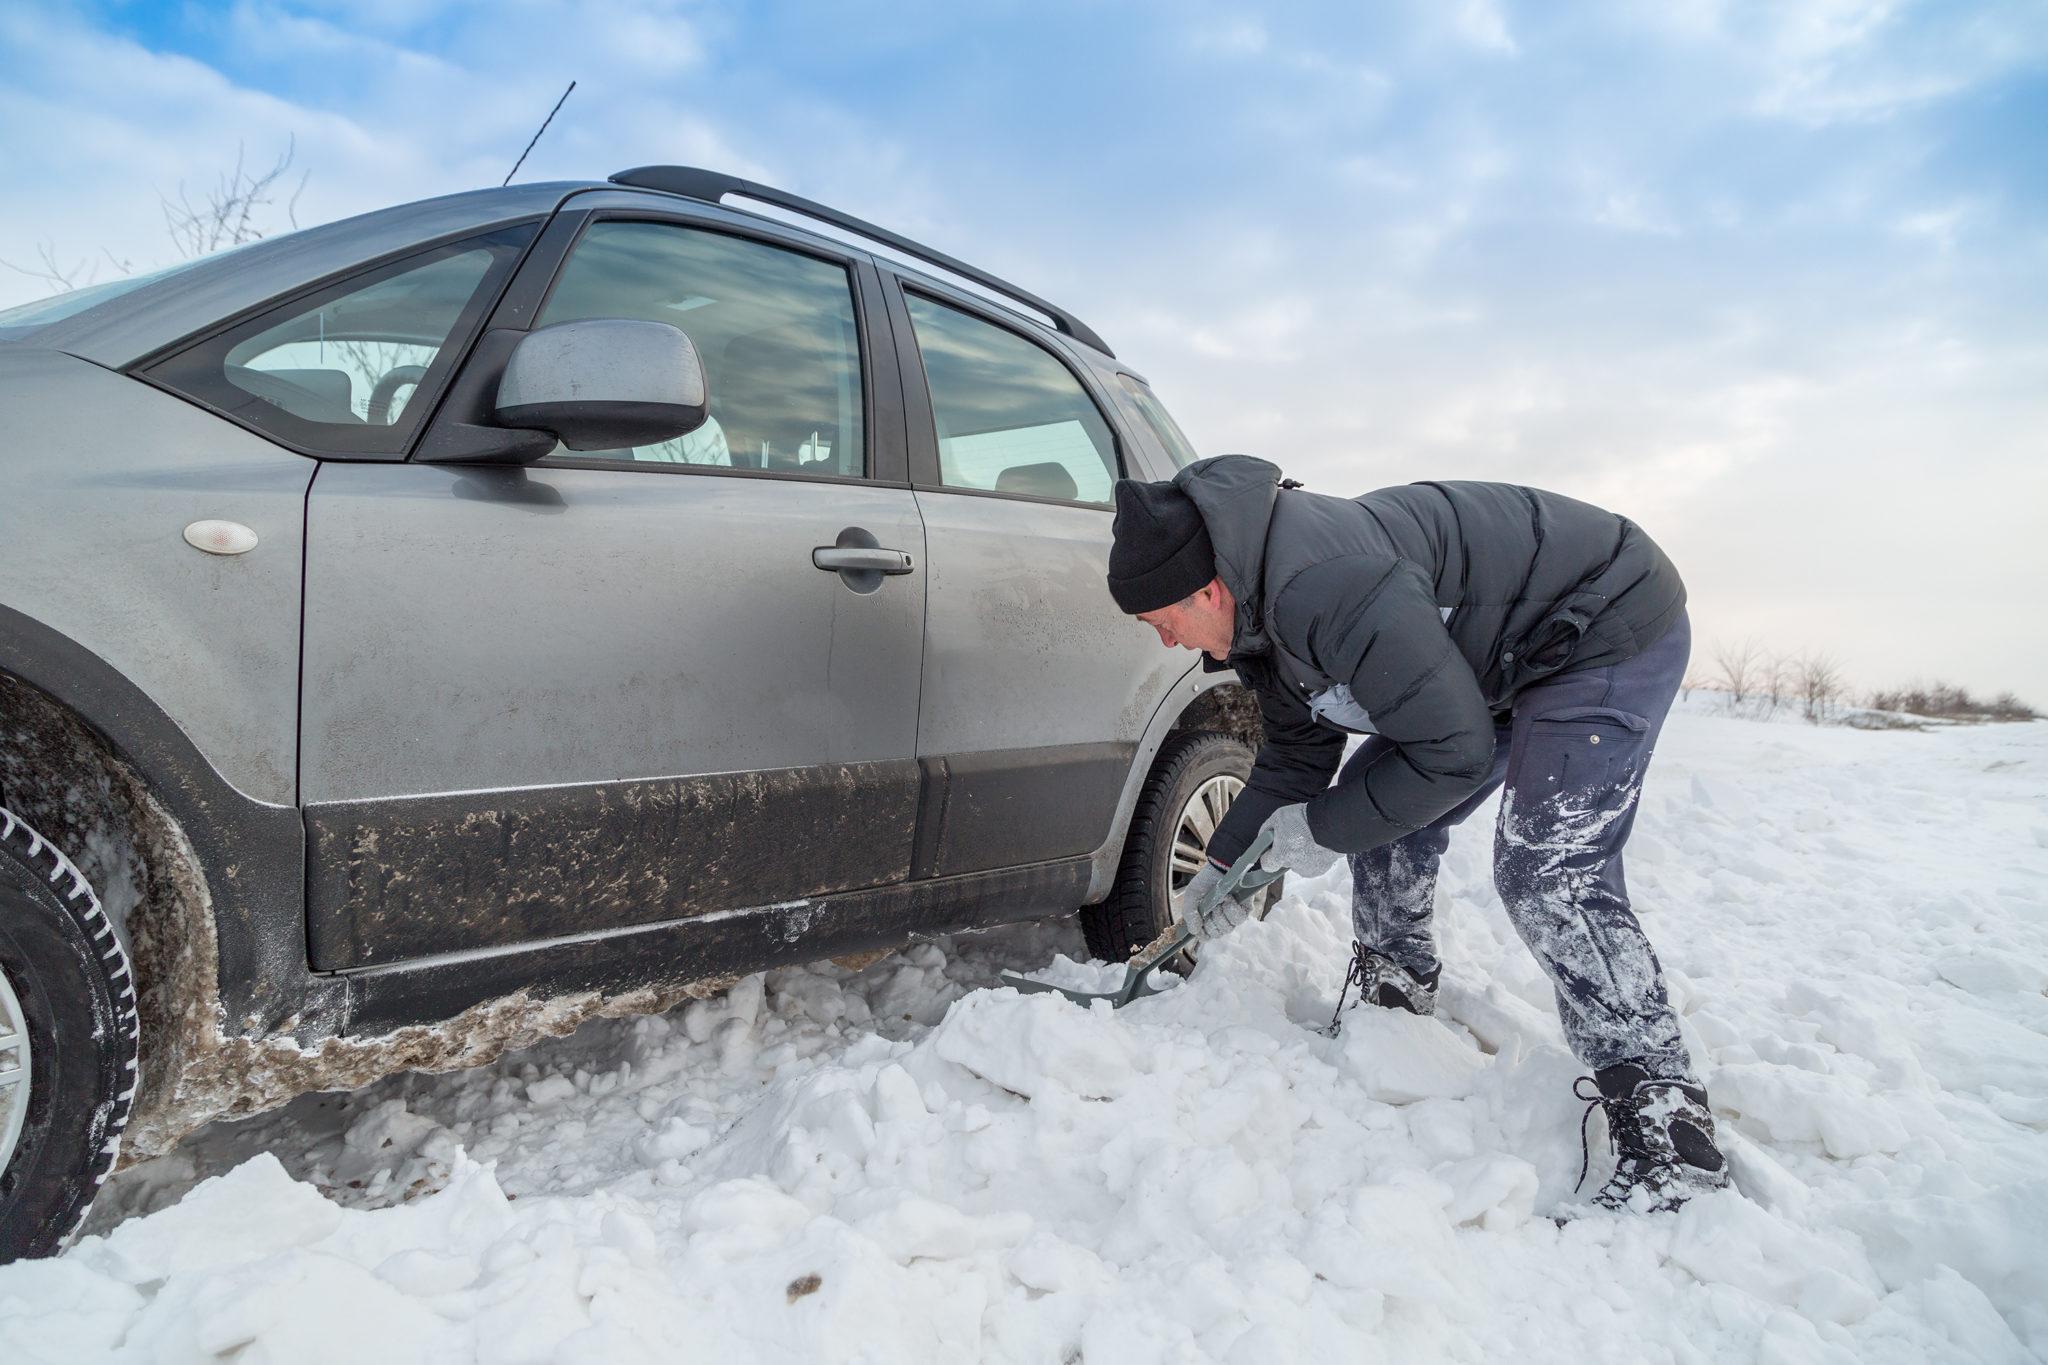 man shoveling snow to free his stuck car